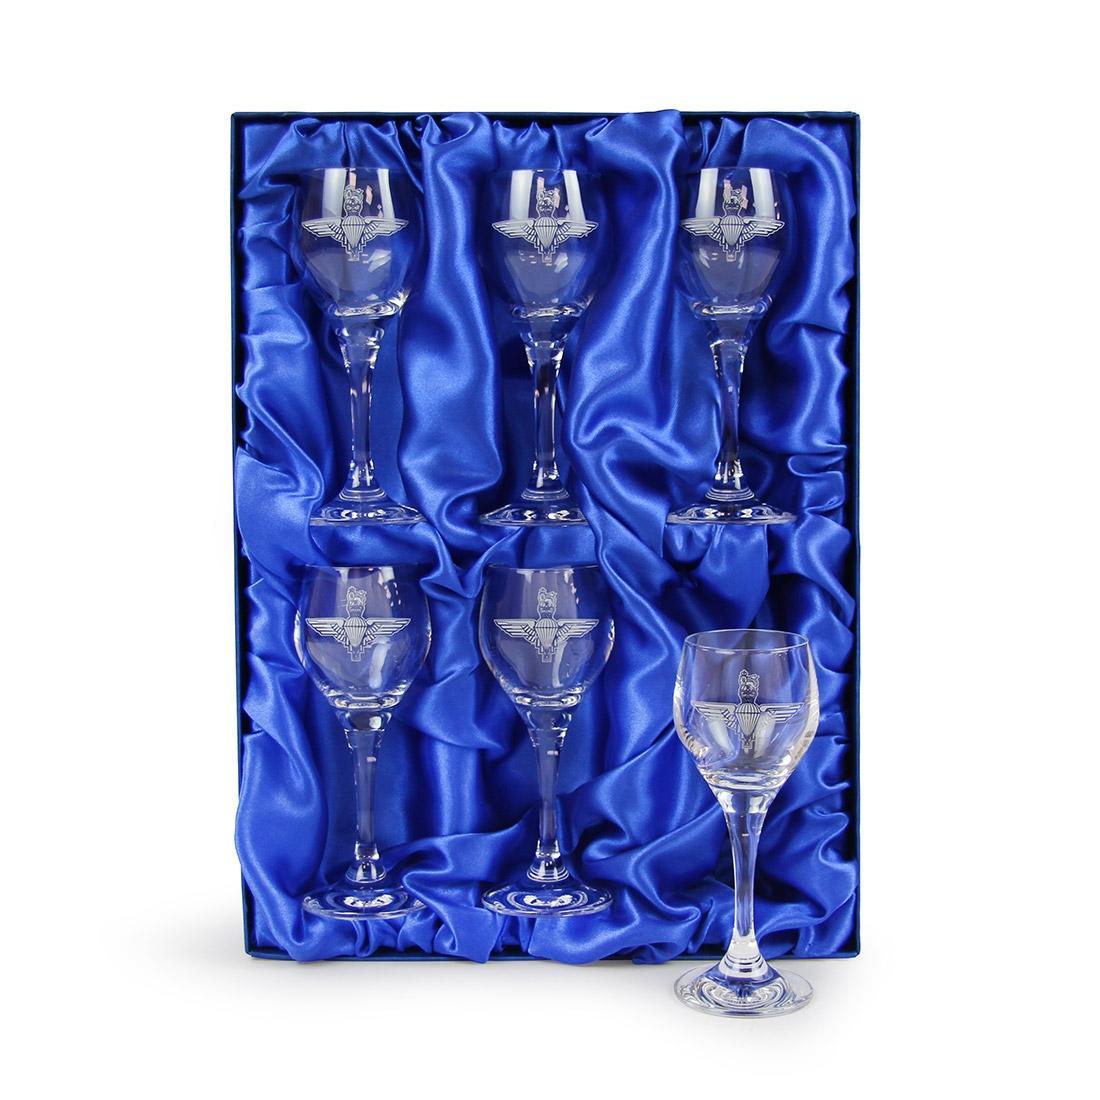 6 Crystal Port Glasses Engraved - Parachute Regiment